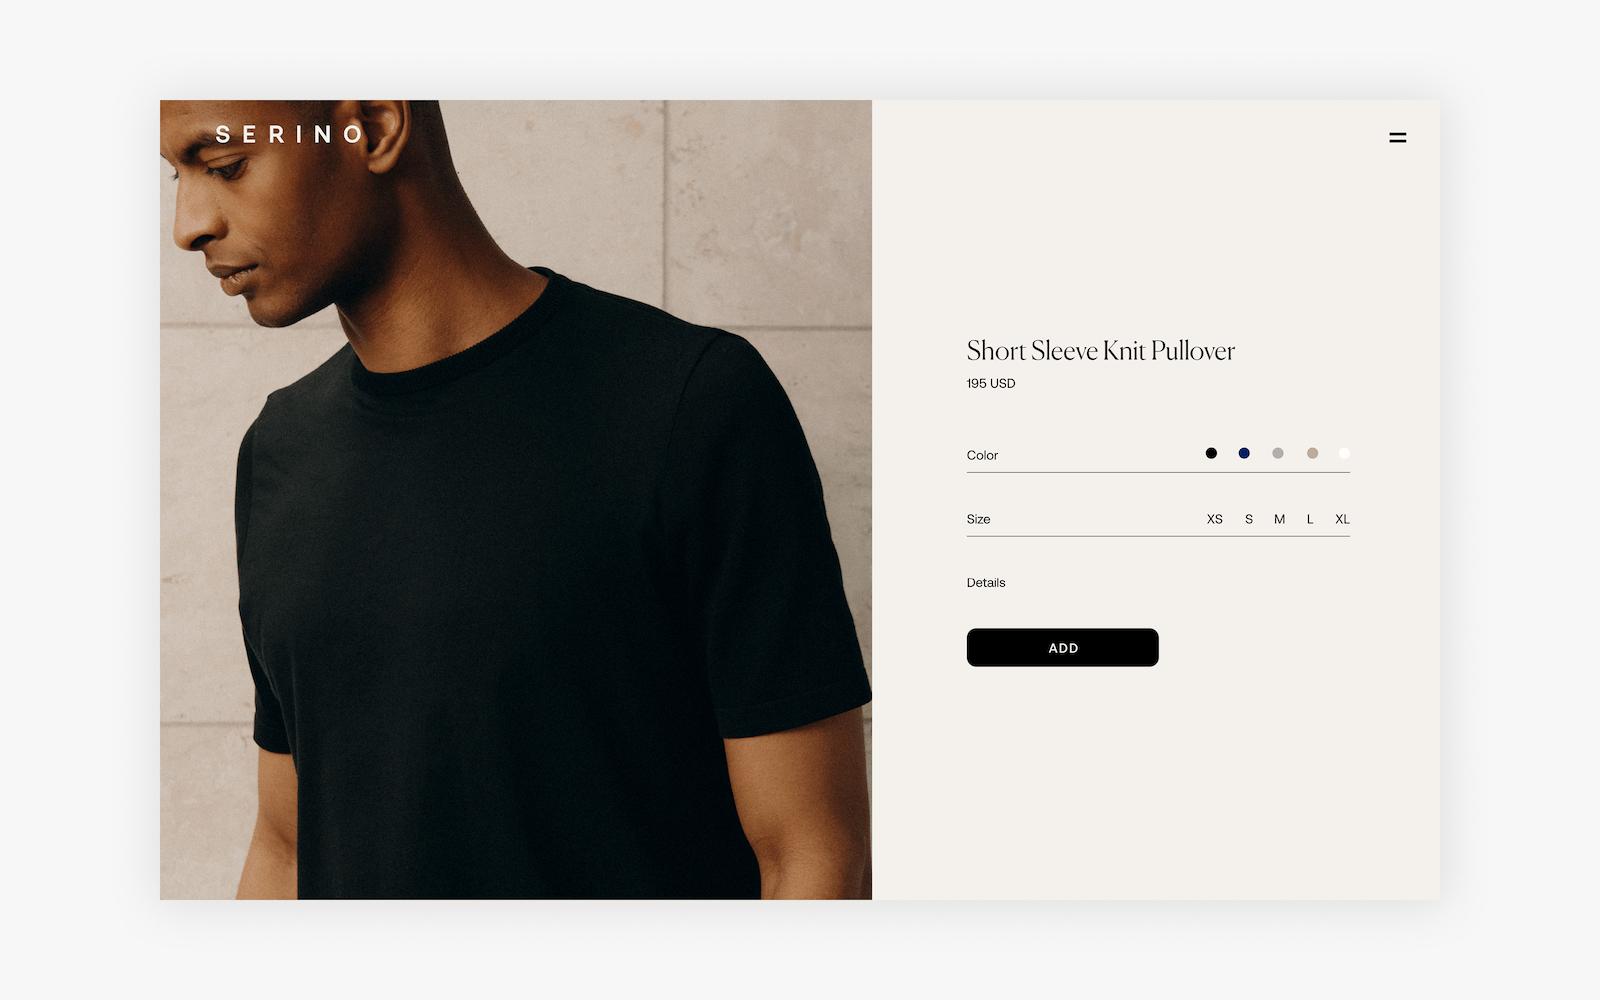 Serino Studio - Ecommerce Shopify Website Design + Development Comps